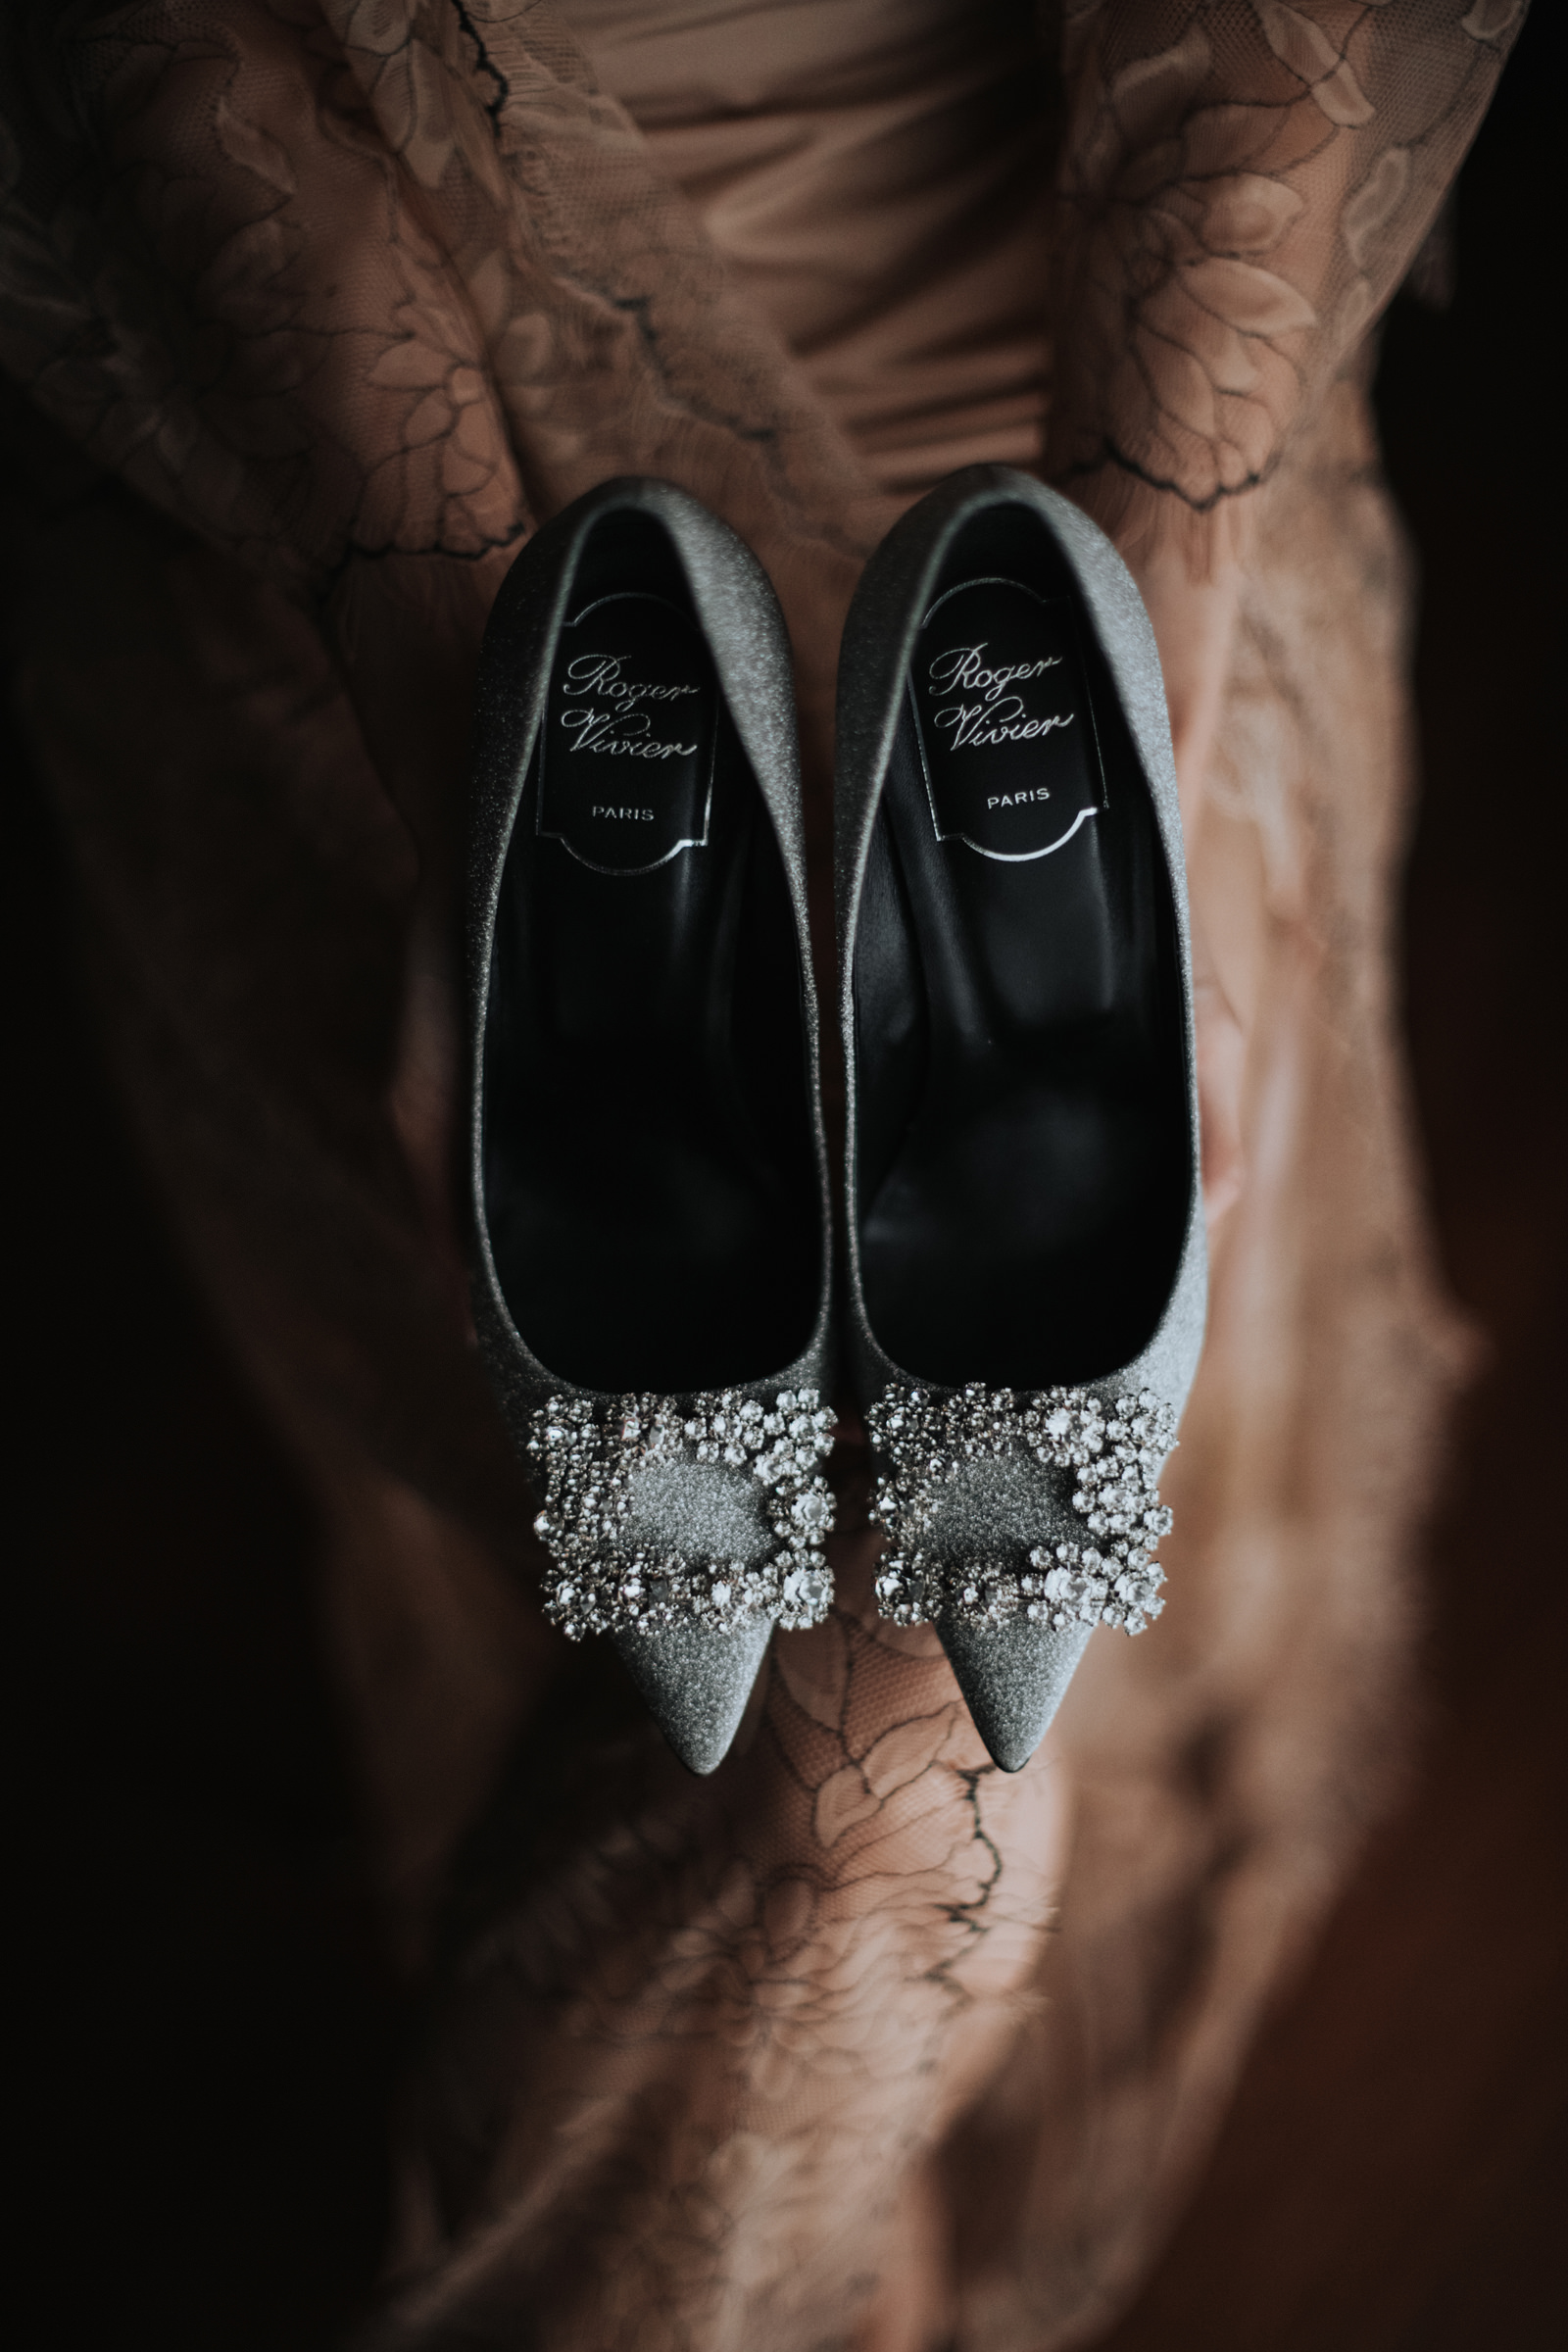 detail_shot_of_jeweled_bridal_shoes_by_mun_keat_studio